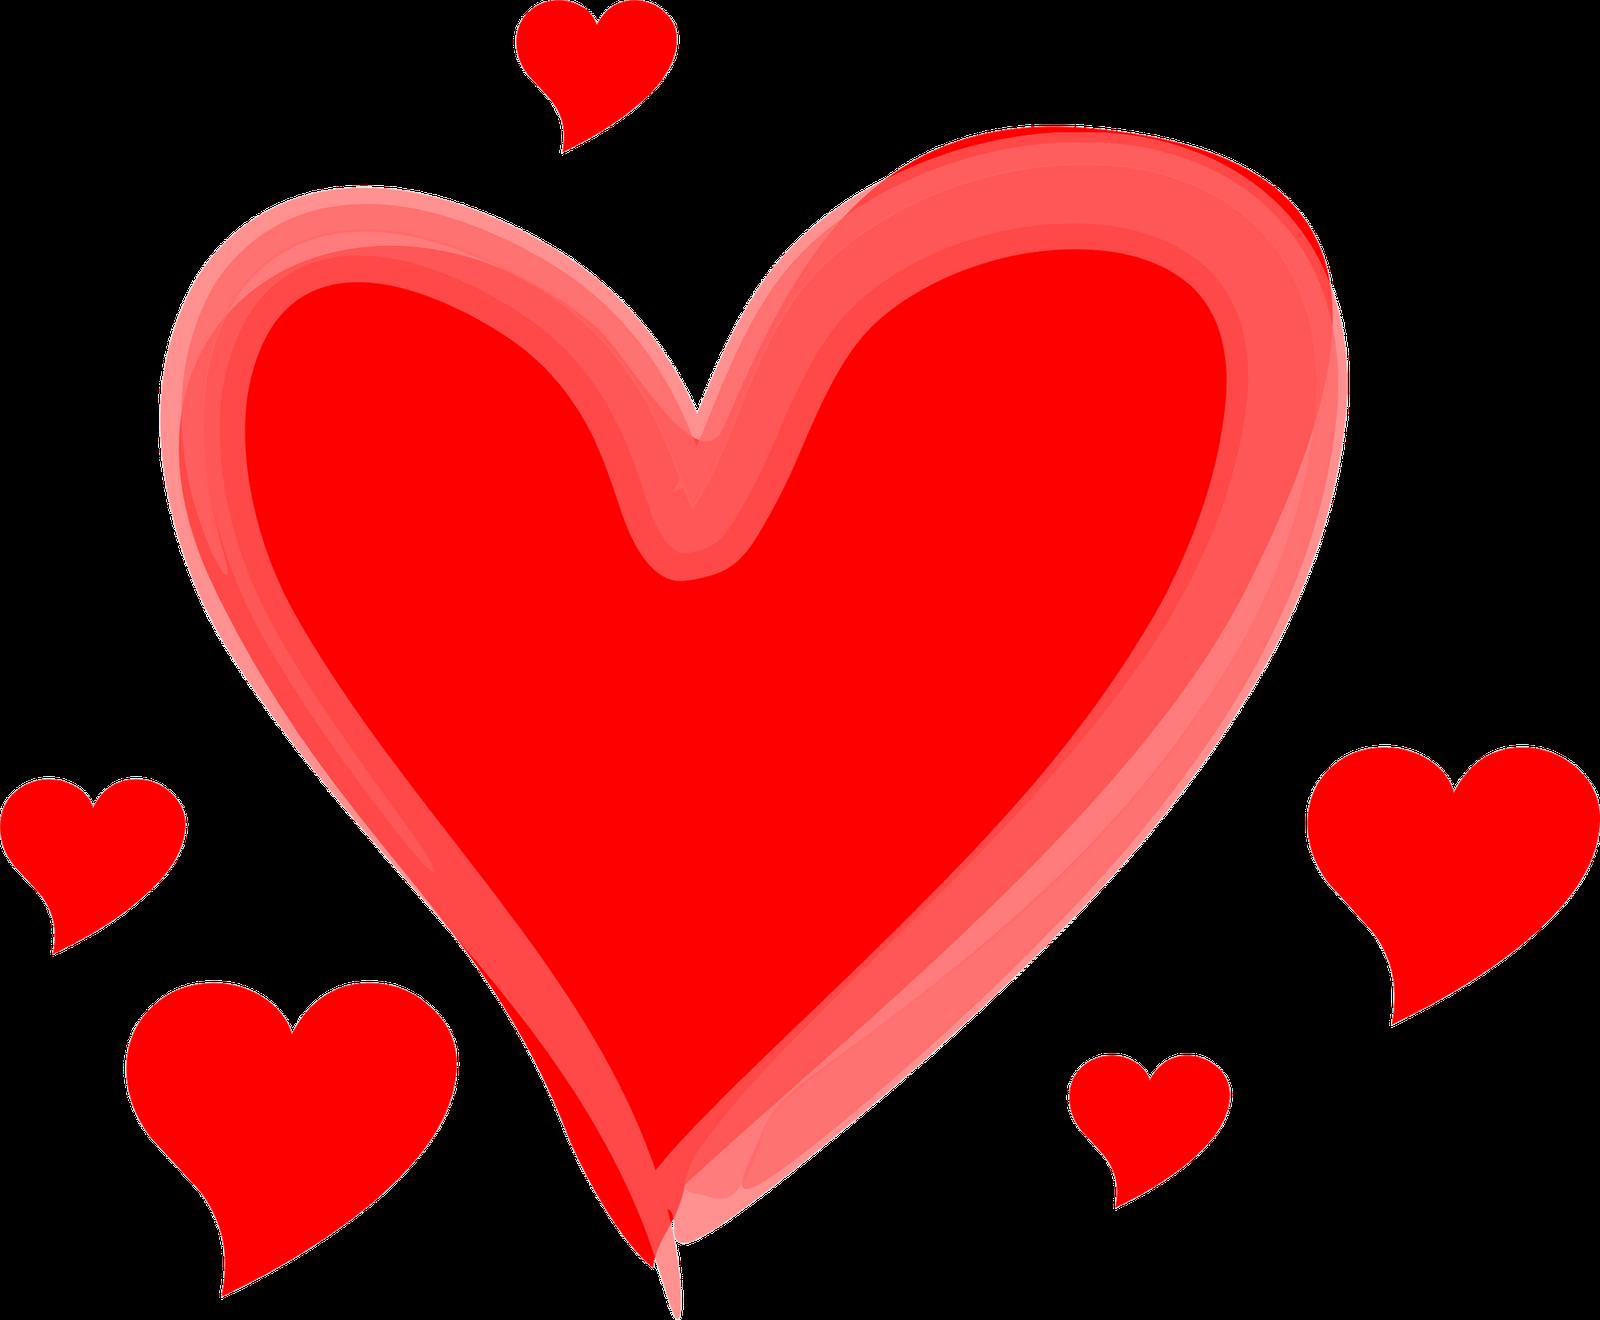 http://2.bp.blogspot.com/-K95-dVyoQh0/TVnRizG5WpI/AAAAAAAABPA/8iYqlTOPLM8/s1600/Love_heart_uidaodjsdsew.png